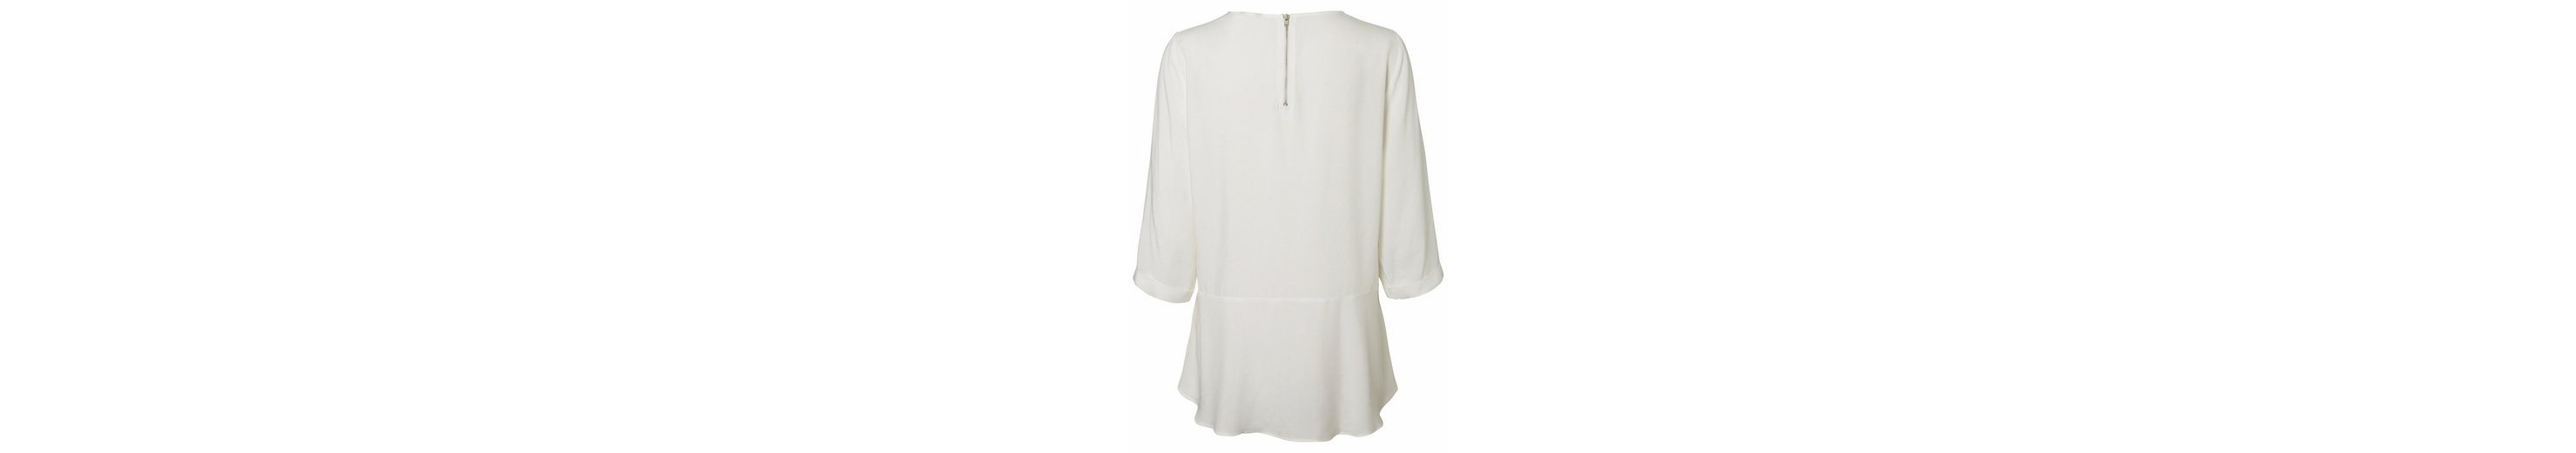 Vero Moda Shirtbluse BOCA FRILL Spielraum Online Ebay Y4iOW